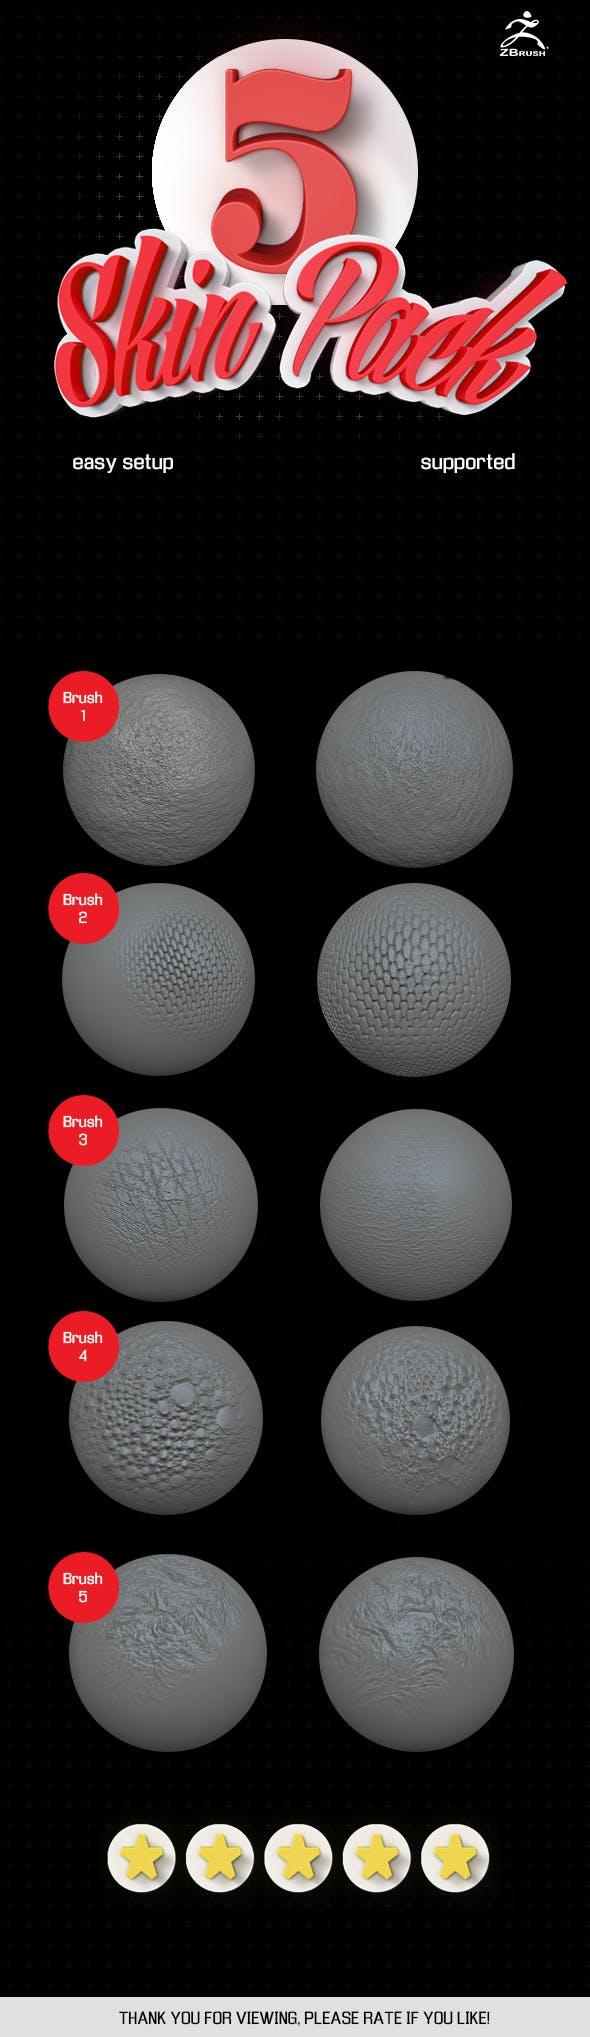 5 Skin brush pack ZBrush vol.1 - 3DOcean Item for Sale